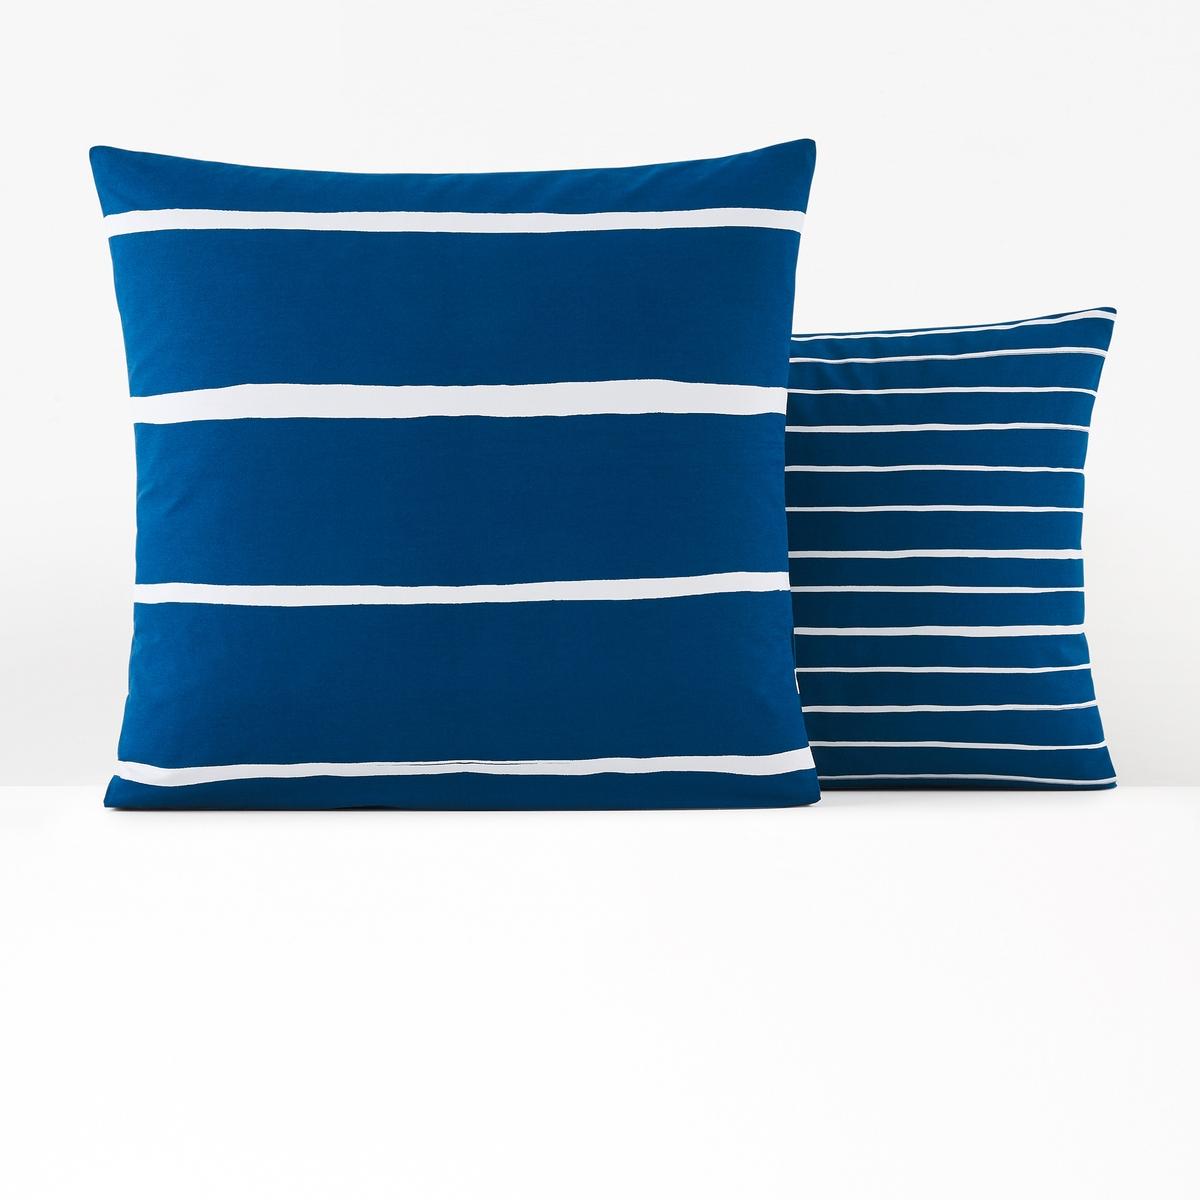 Наволочка La Redoute хлопок Glenans 50 x 70 см синий наволочка la redoute flooch 50 x 30 см бежевый